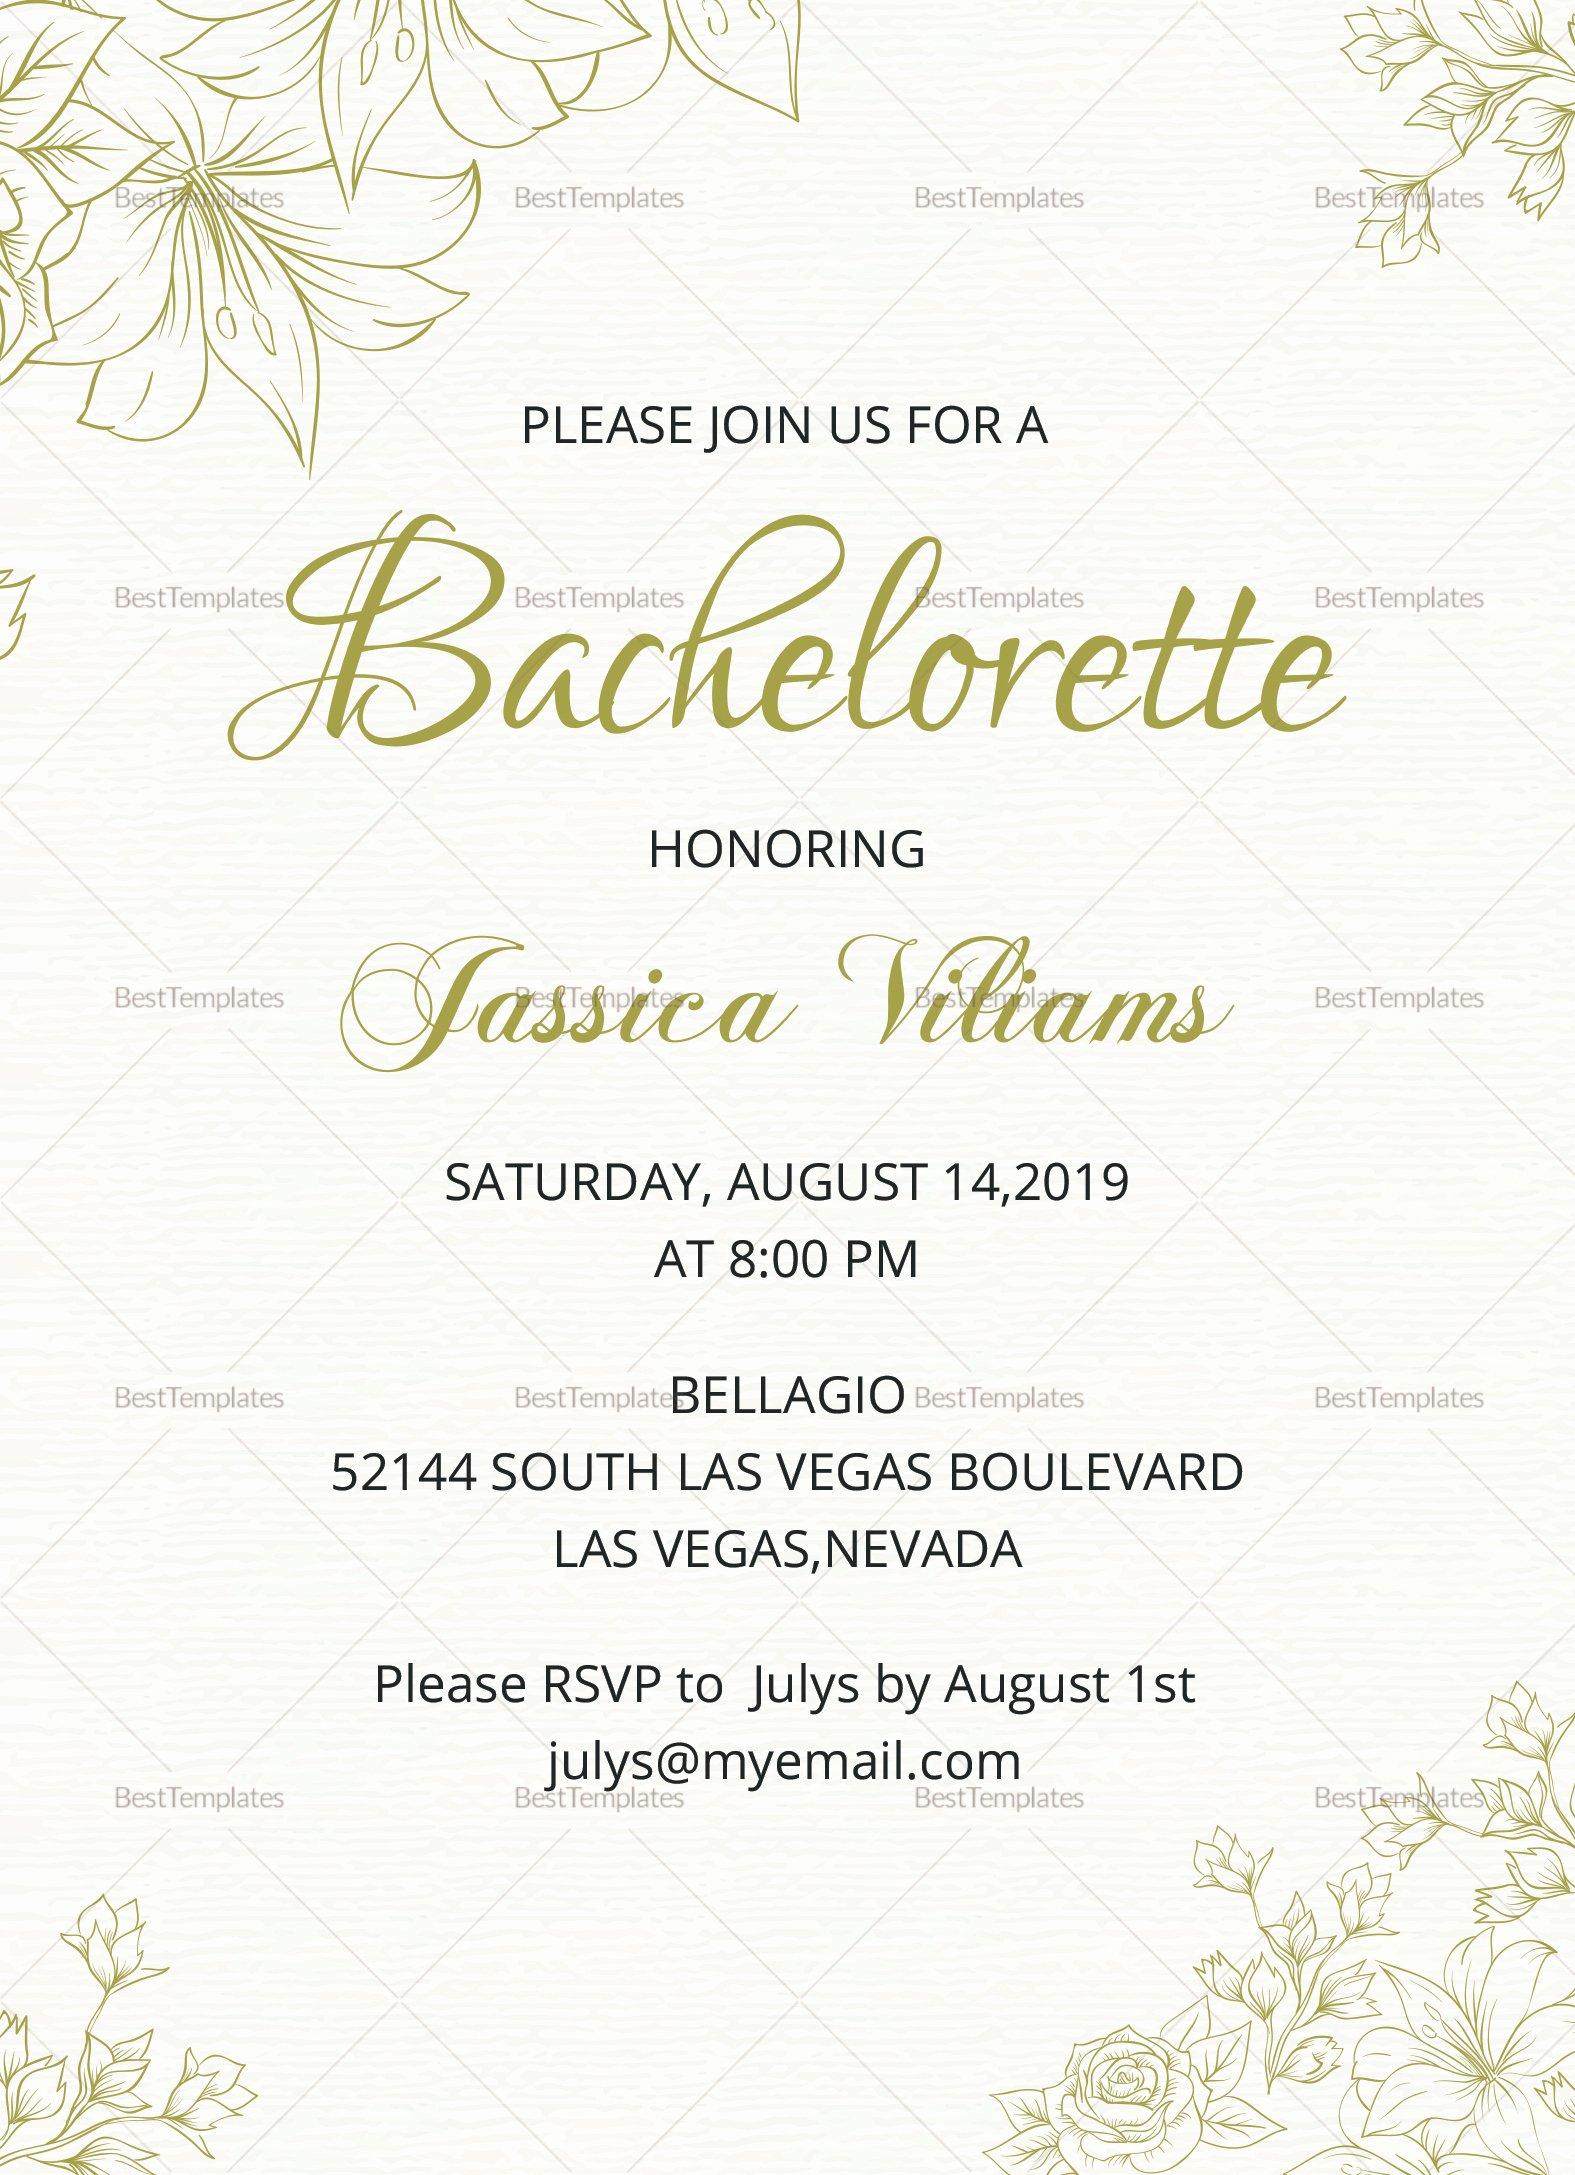 Bachelorette Party Invitation Template Free Awesome Simple Bachelorette Party Invitation Design Template In